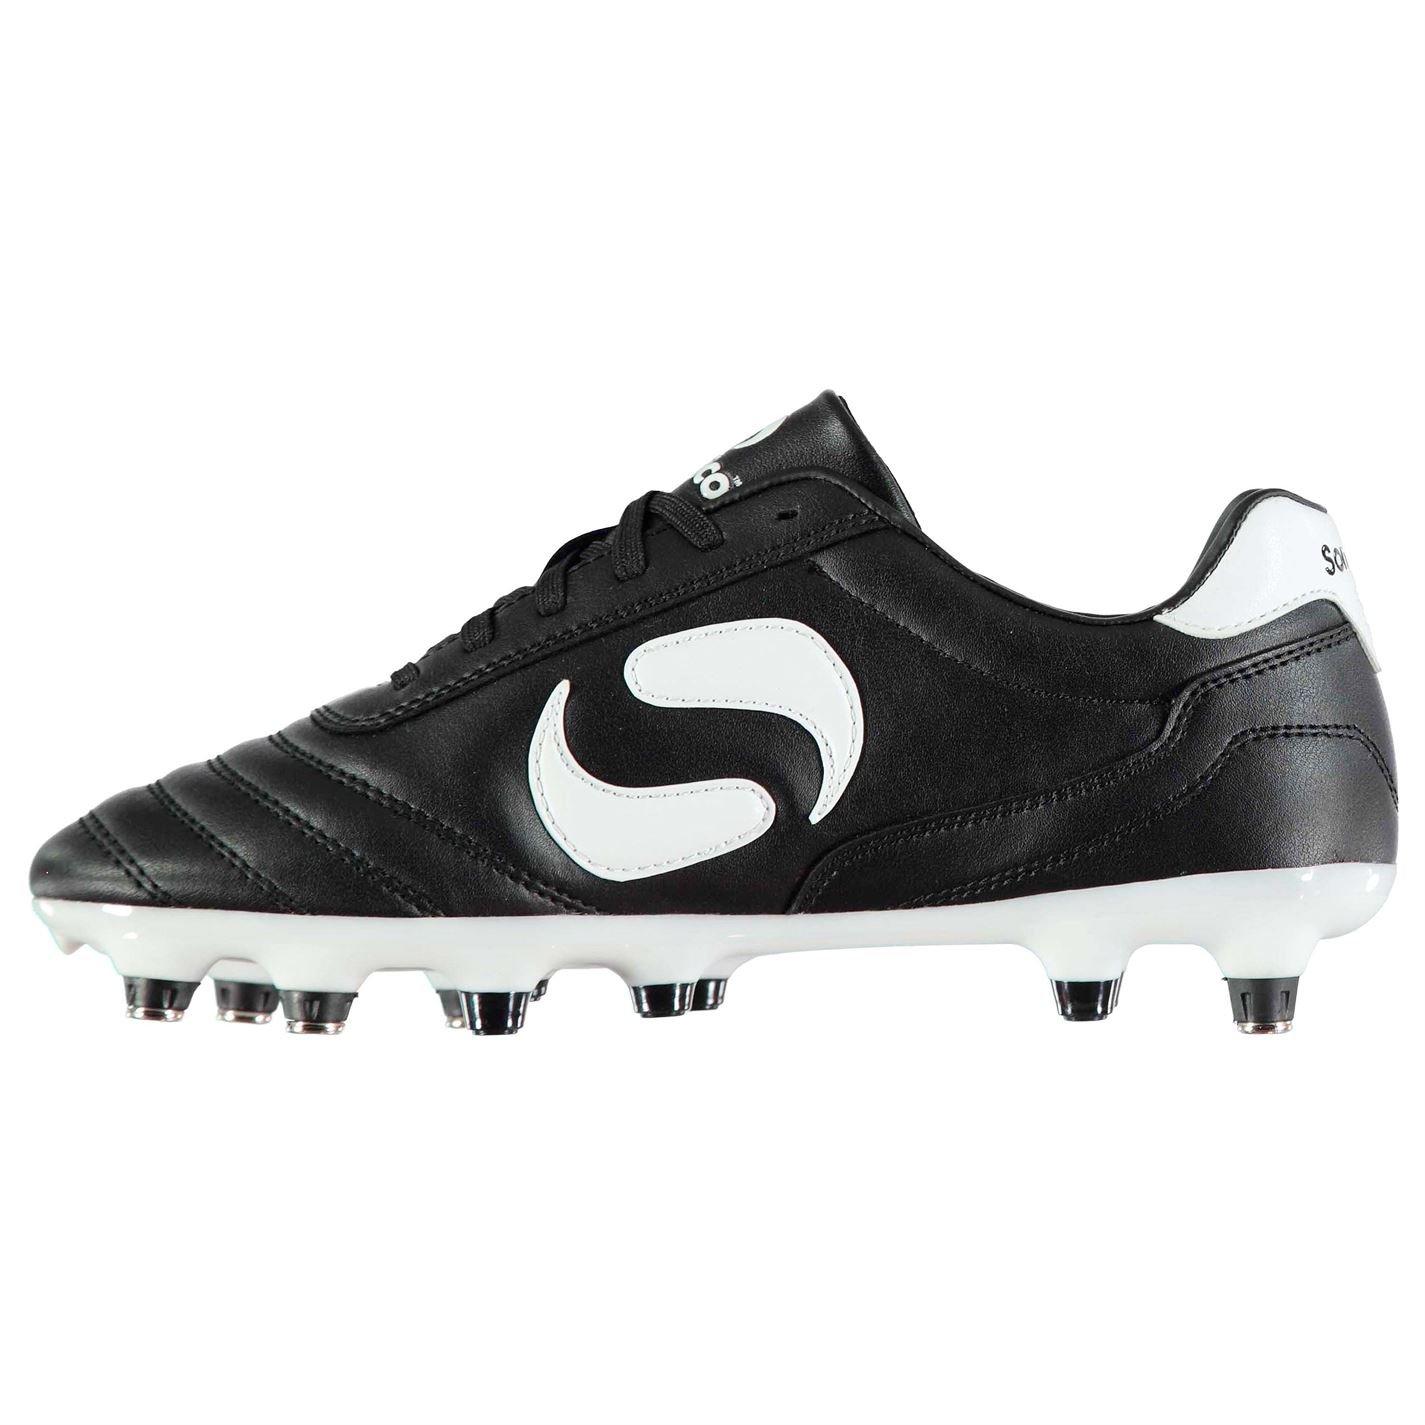 Sondico Kids Strike SG Junior Football Boots Soft Ground Lace Up Studs   Amazon.co.uk  Shoes   Bags 3265ba21589